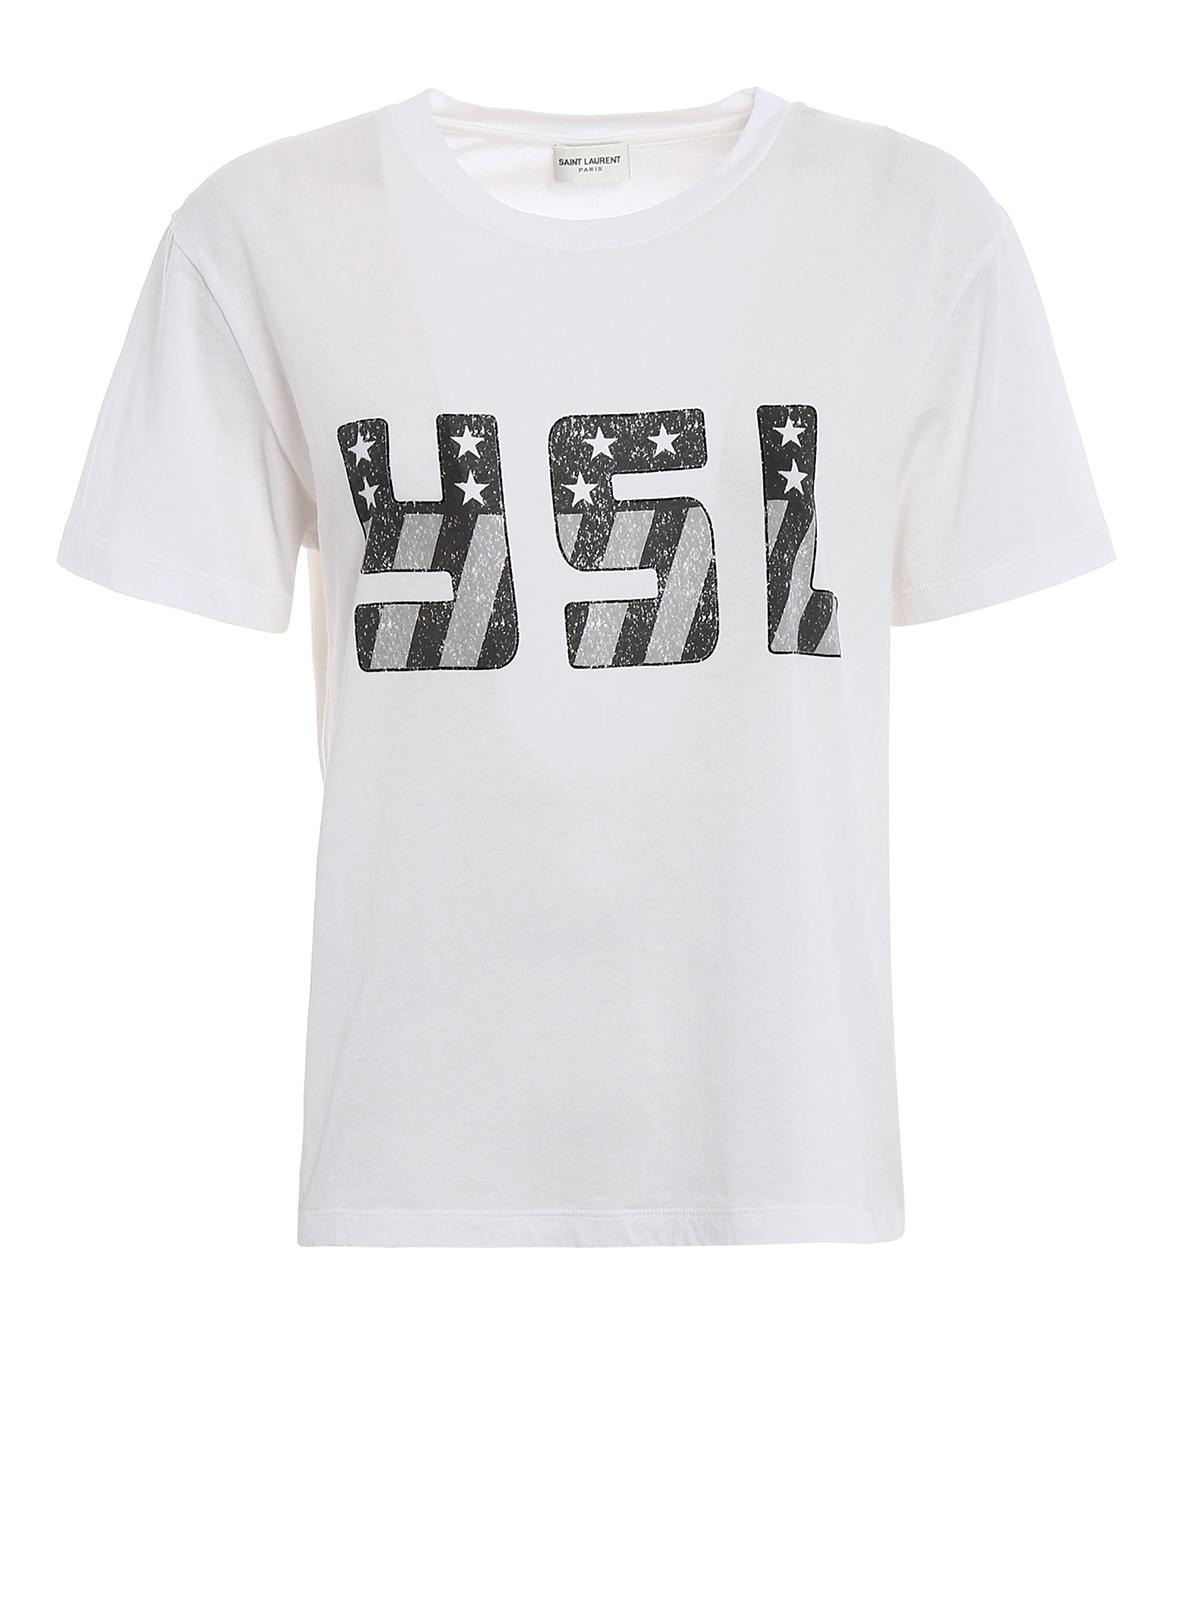 ysl print white t shirt by saint laurent t shirts ikrix. Black Bedroom Furniture Sets. Home Design Ideas